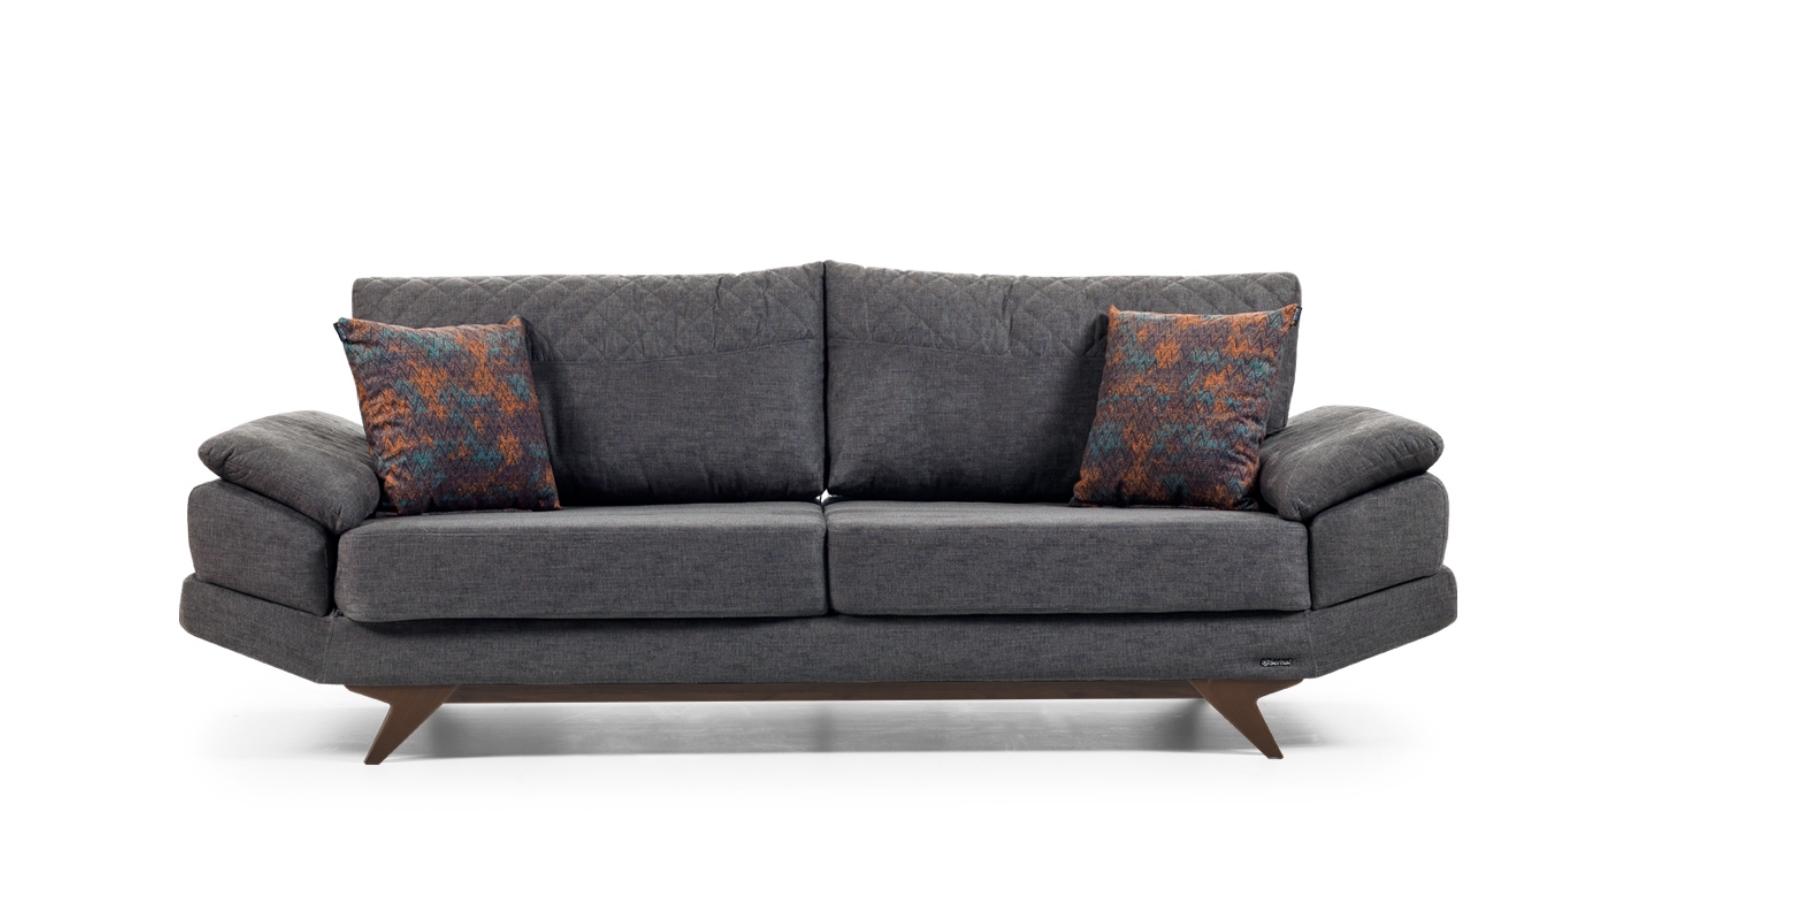 Canapea fixa 3 locuri Twice Grey K3